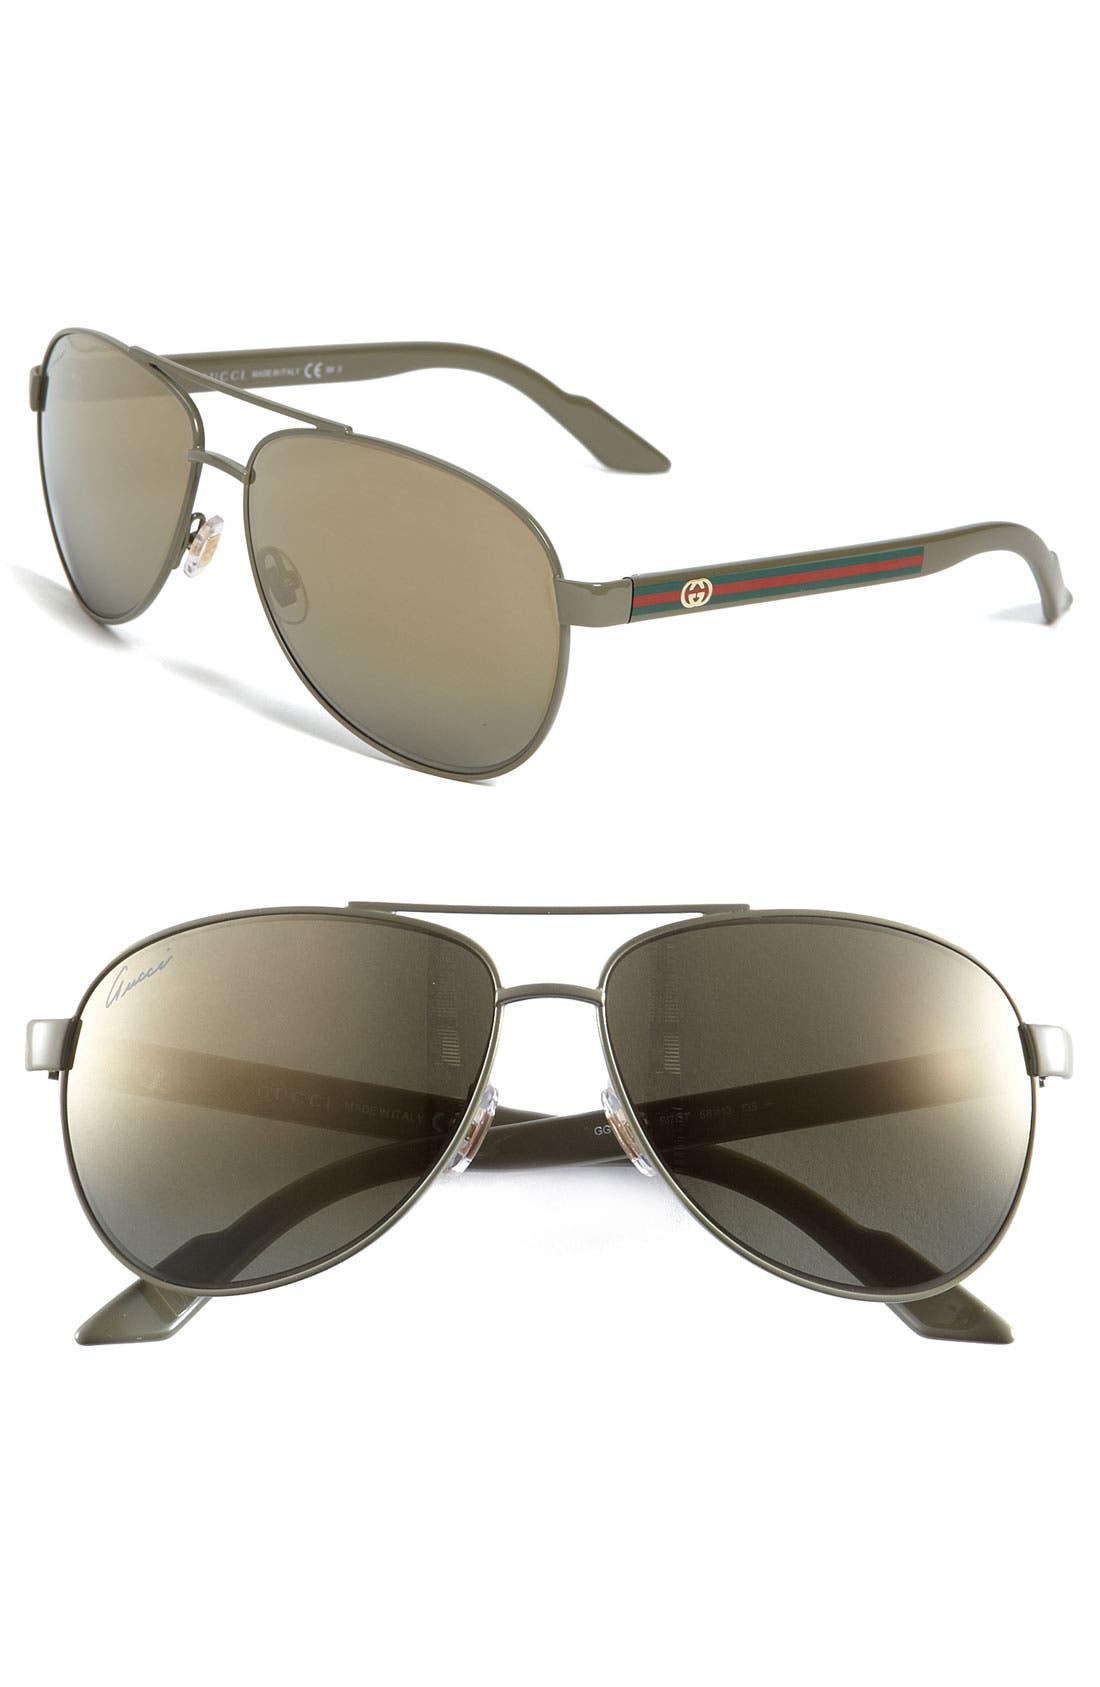 Alternate Image 1 Selected - Gucci 'Ribbon' 58mm Aviator Sunglasses